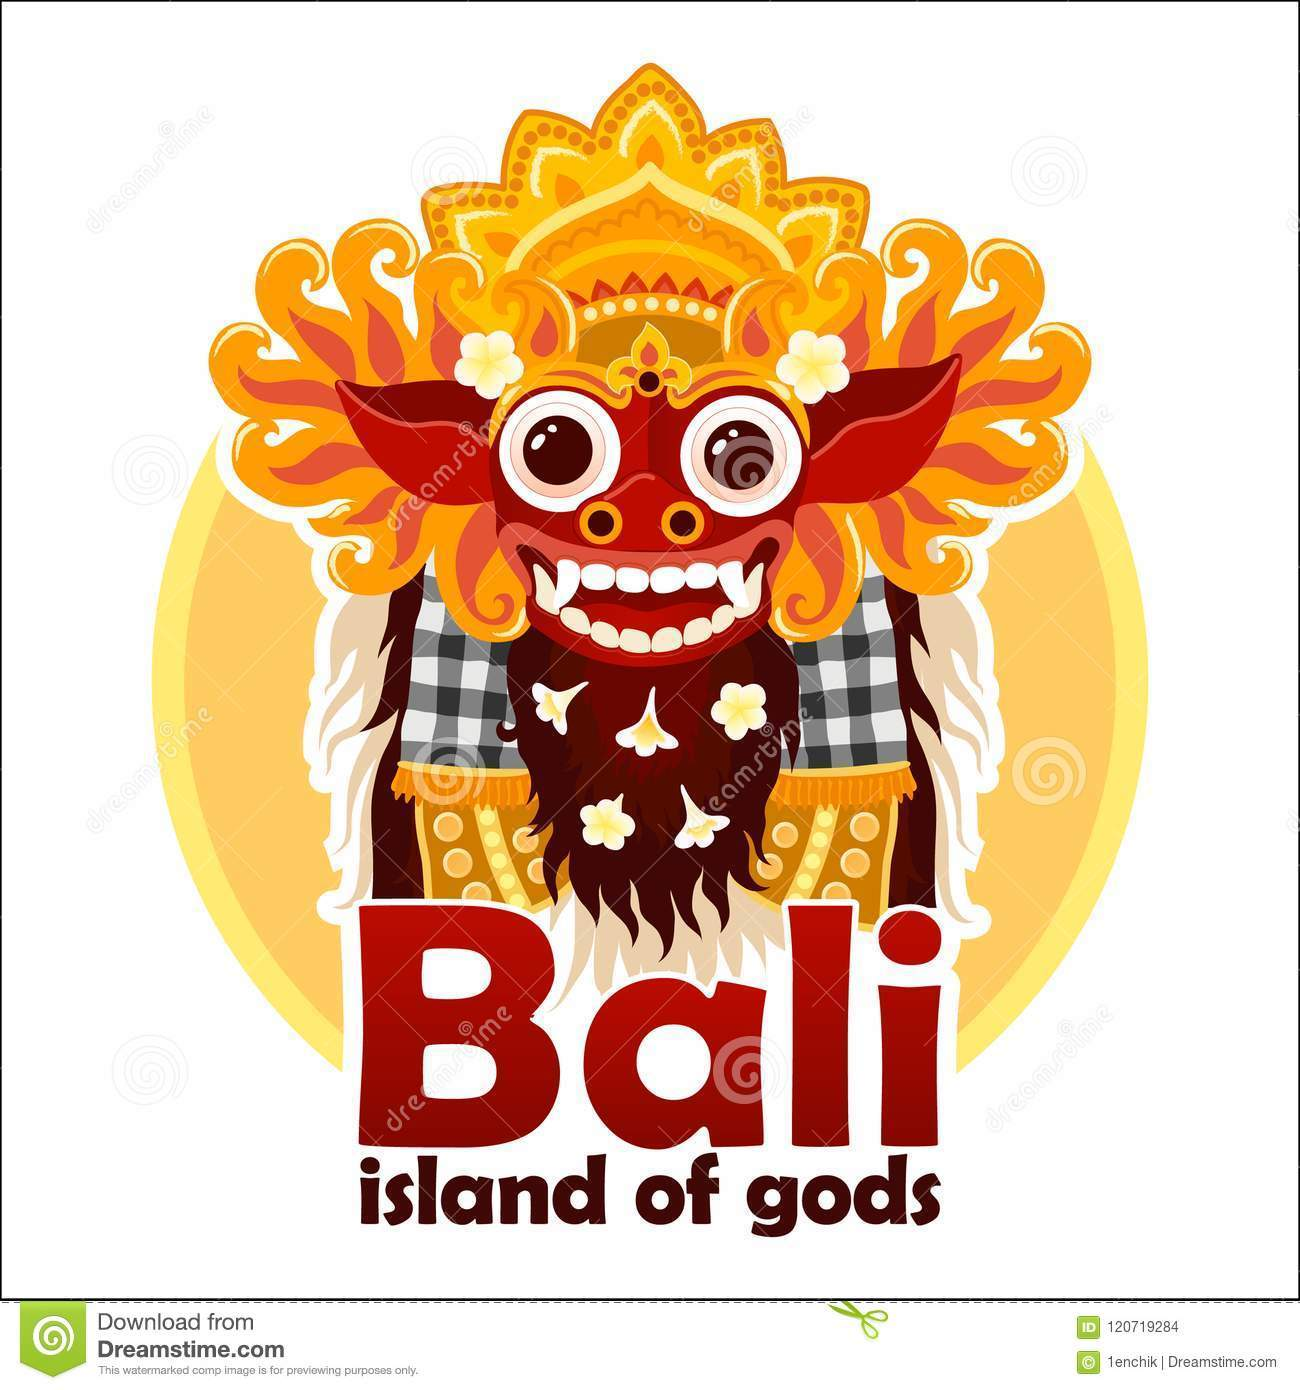 Barong bali clipart clip black and white download Barong bali clipart 4 » Clipart Portal clip black and white download